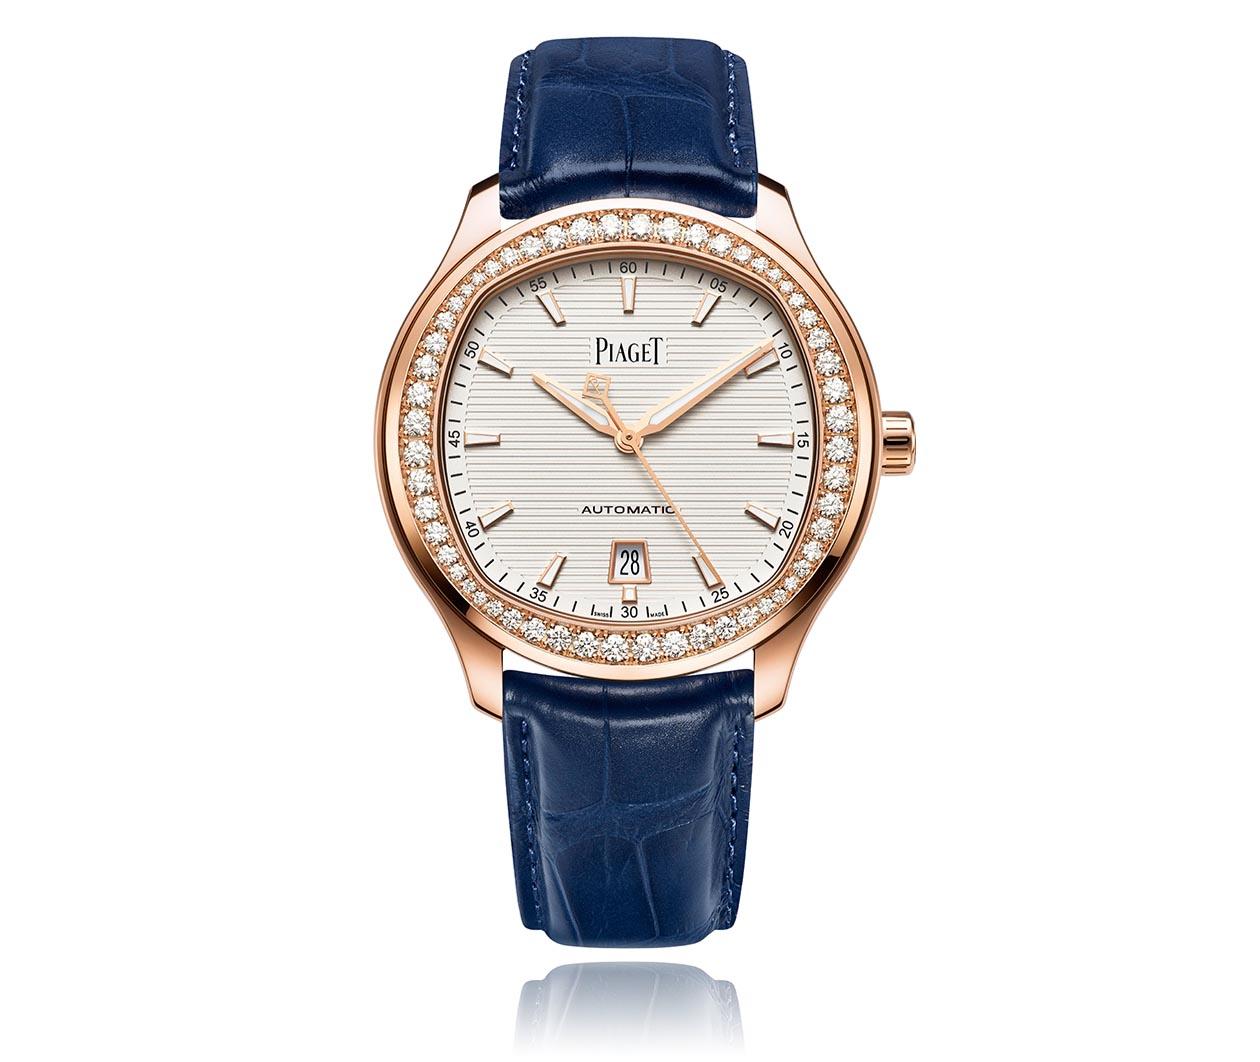 Piaget Polo watch G0A44010 Flatlay FINAL